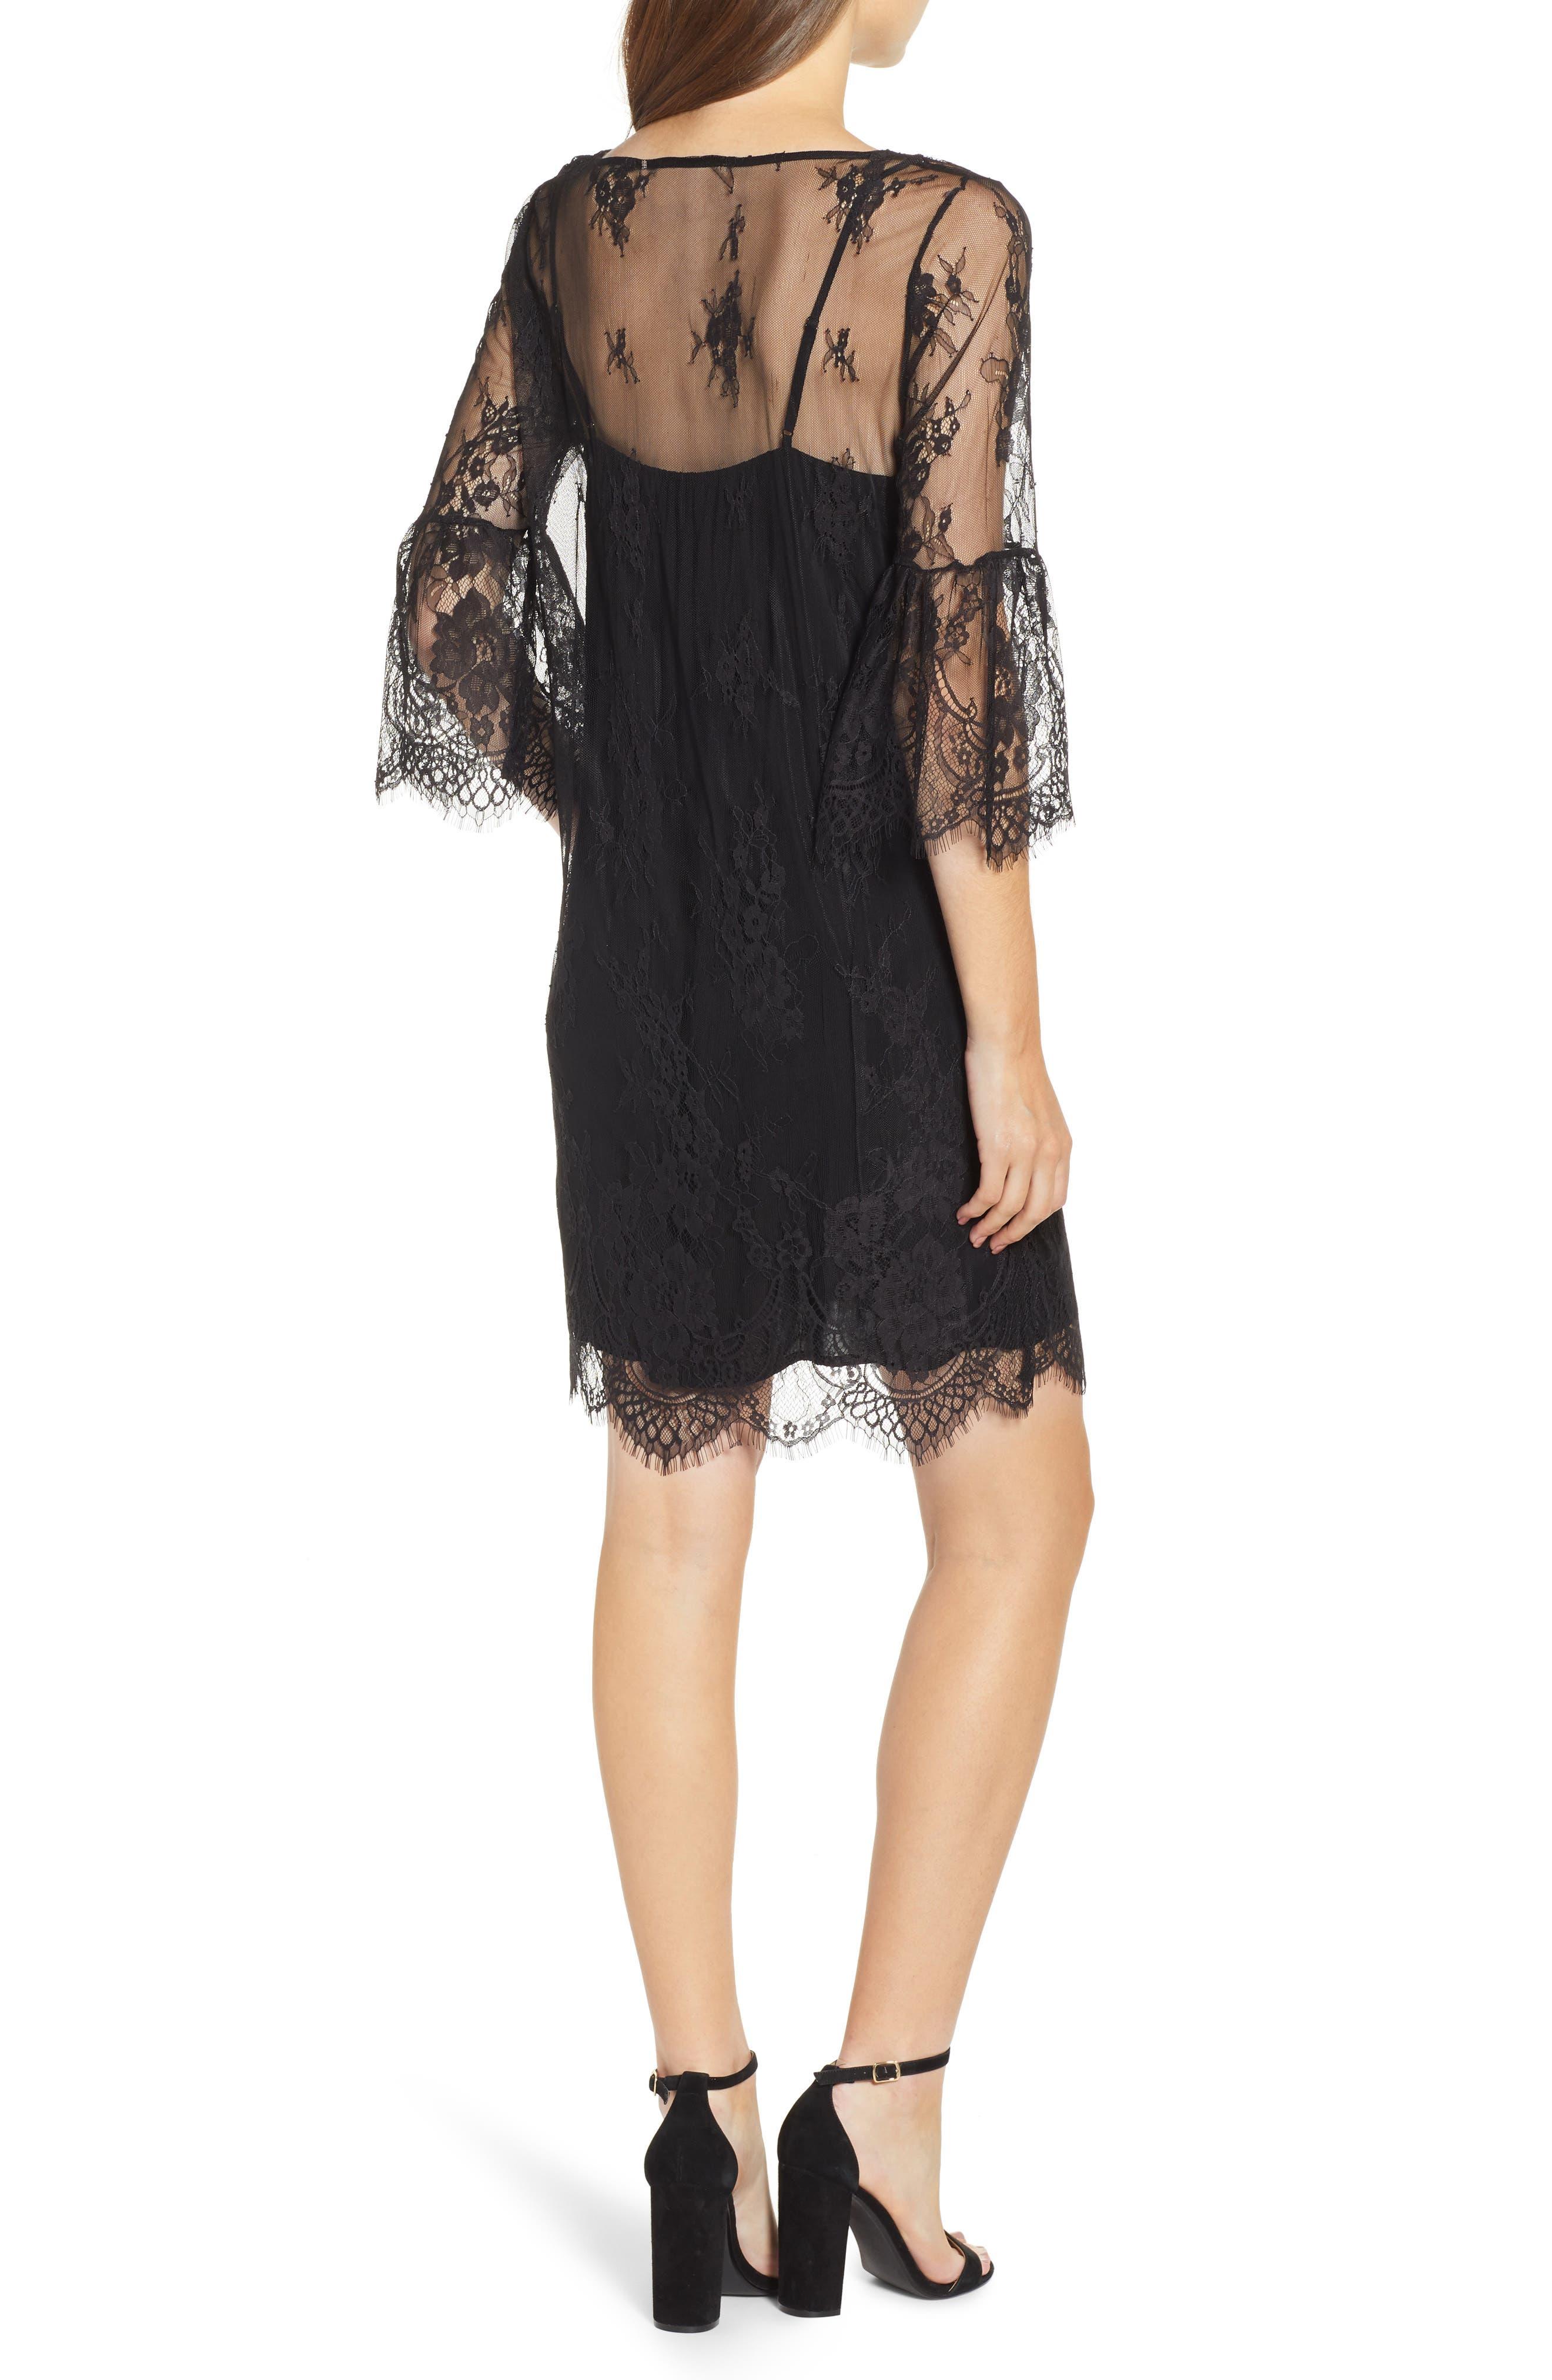 ROSEMUNDE, Aix Lace Dress, Alternate thumbnail 2, color, BLACK